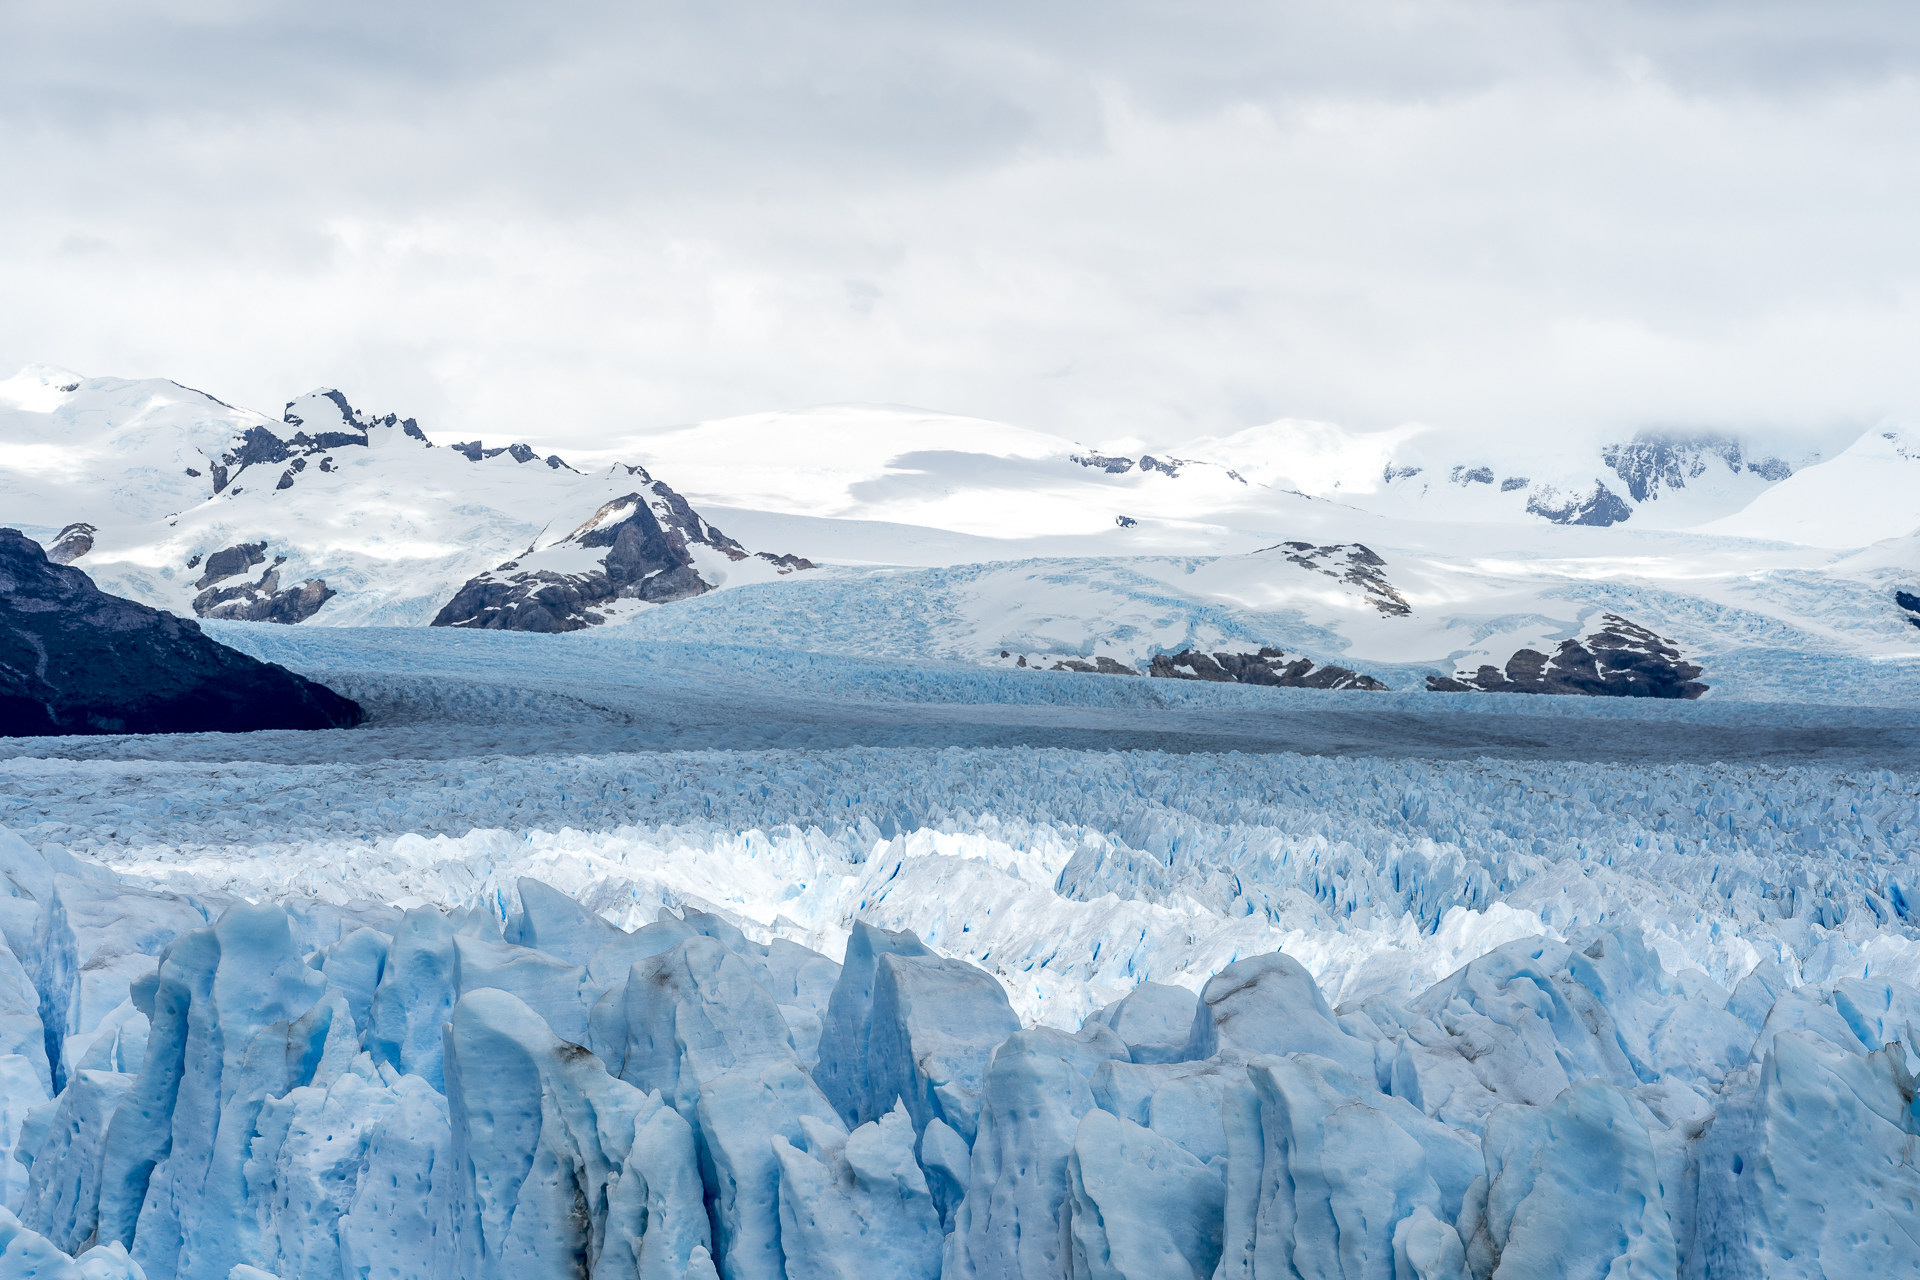 Patagonien Icefield Perito Moreno